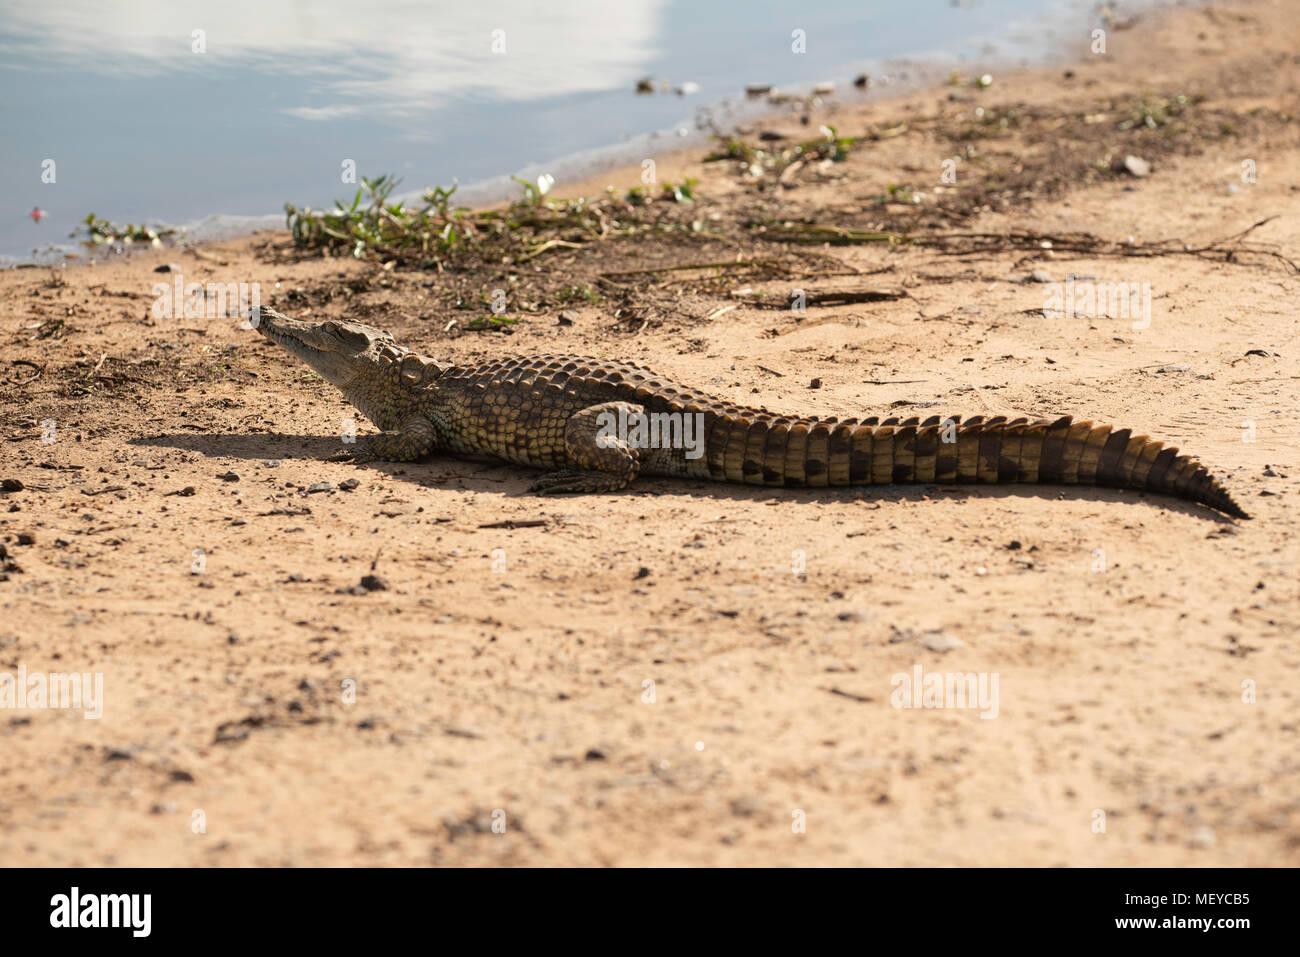 Nile crocodile basking in the sun - Stock Image